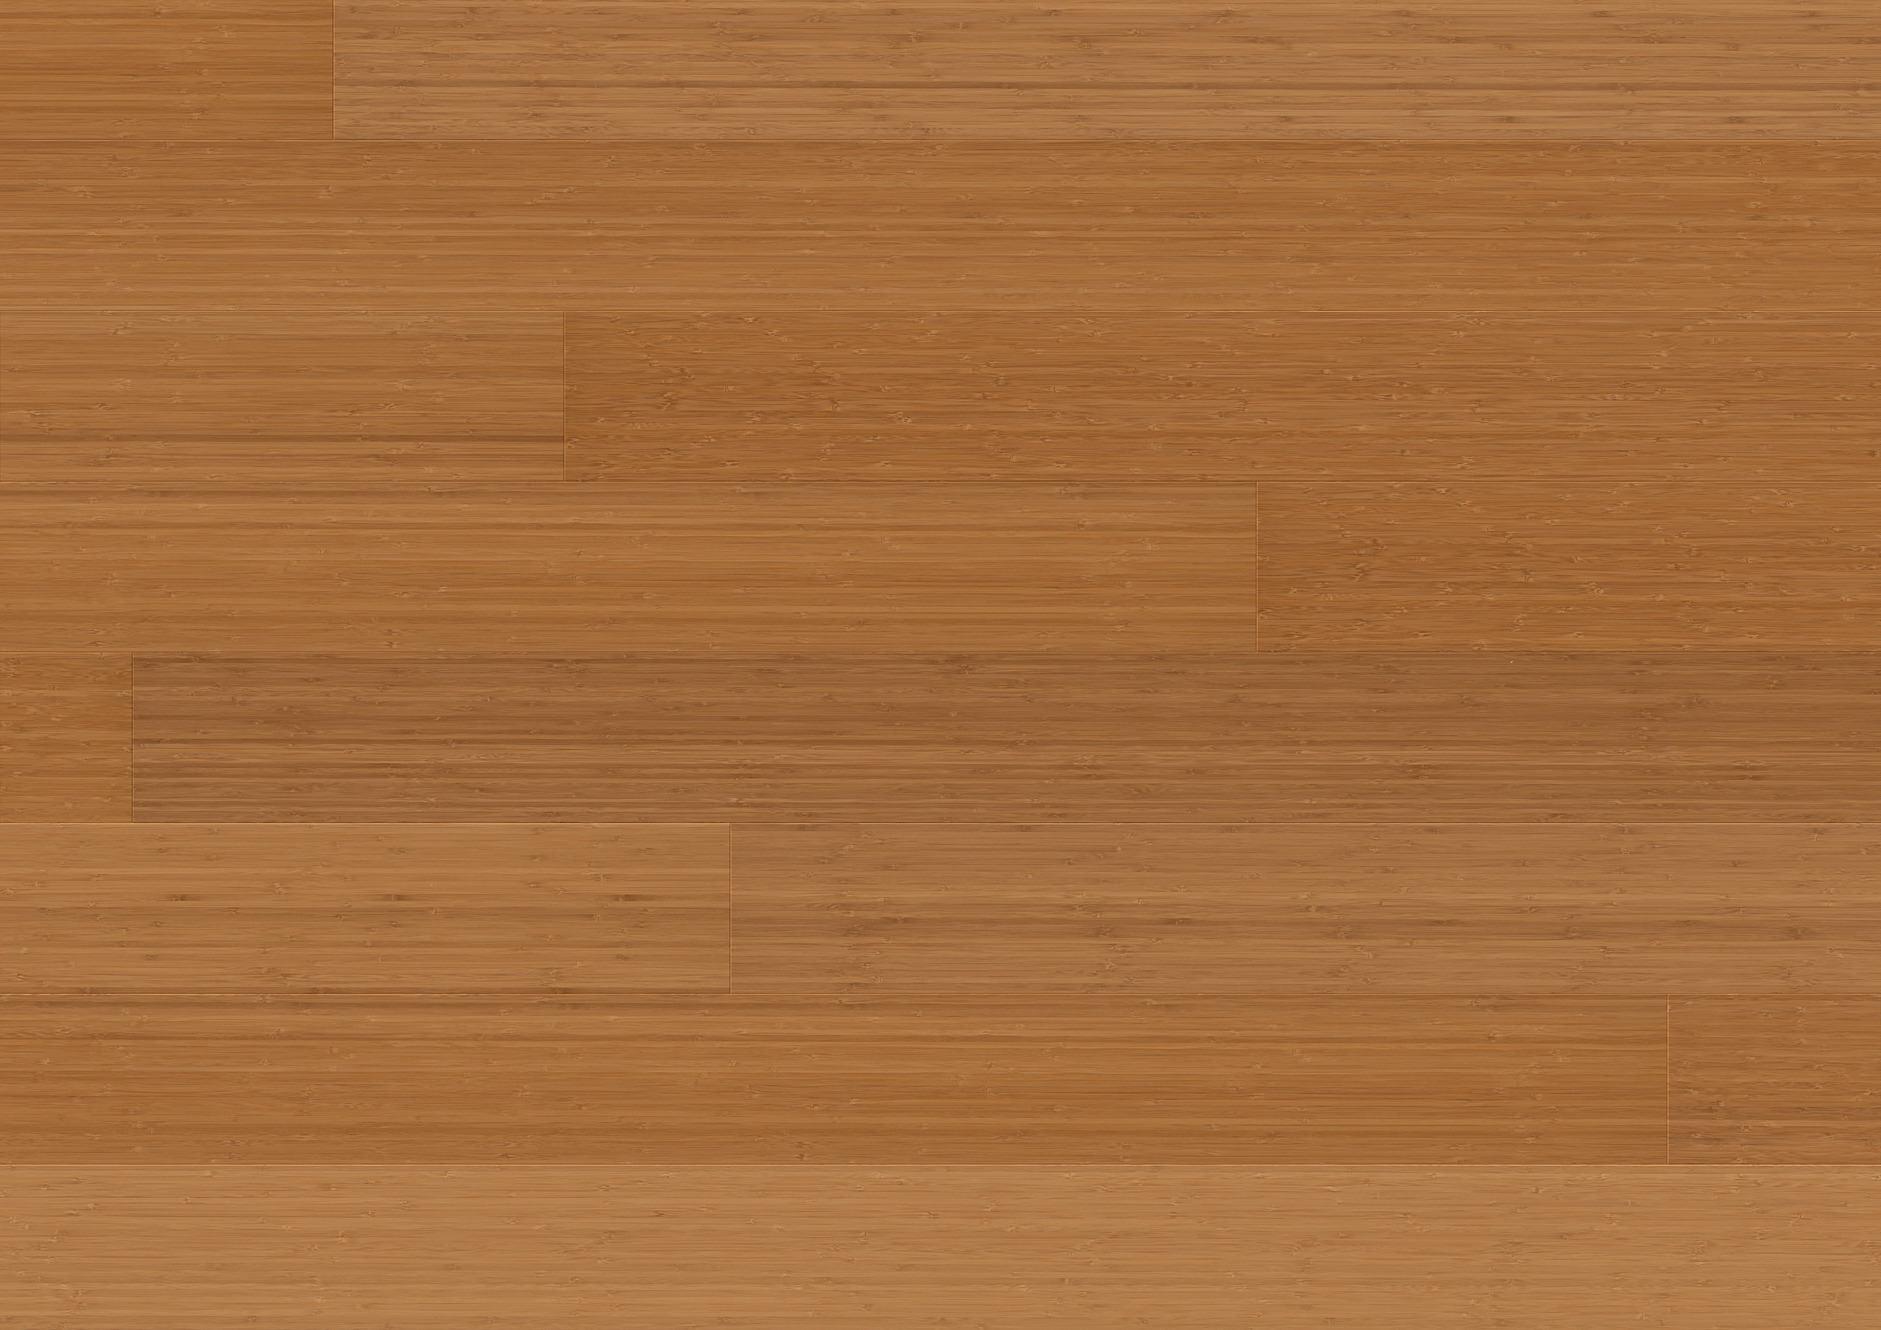 Bambus karamellbeige